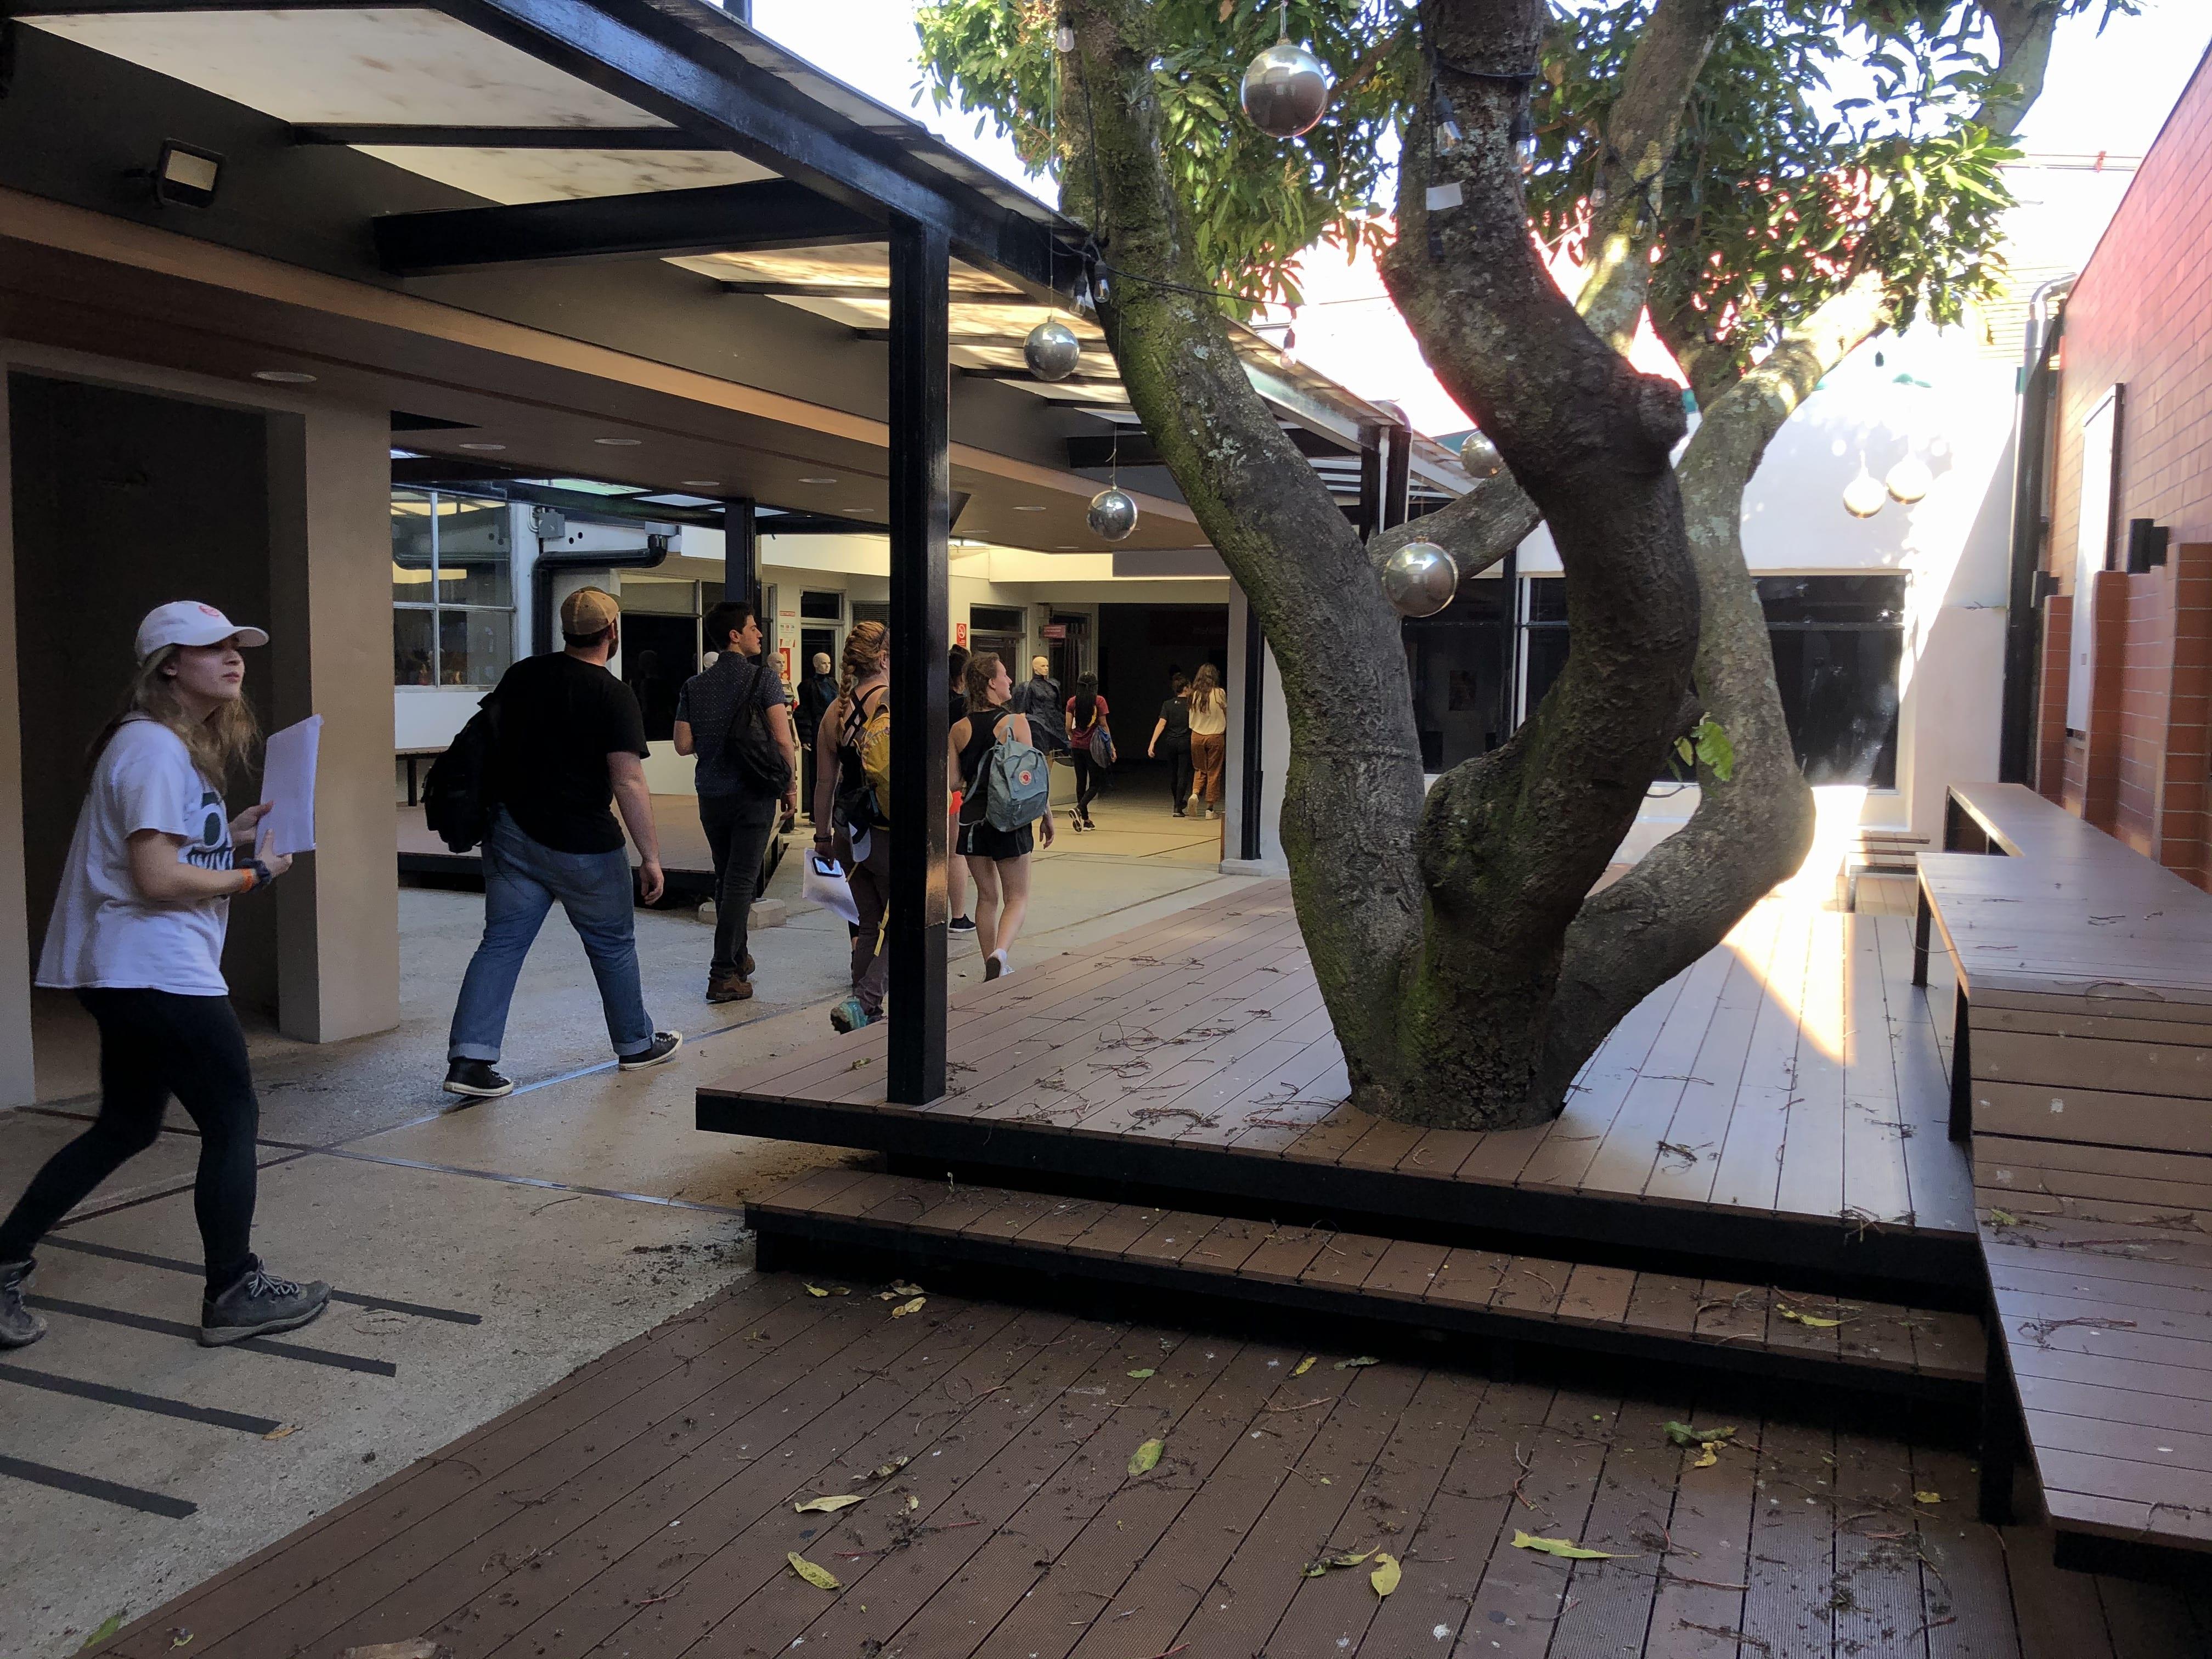 Universidad Veritas campus photos - Central Quad